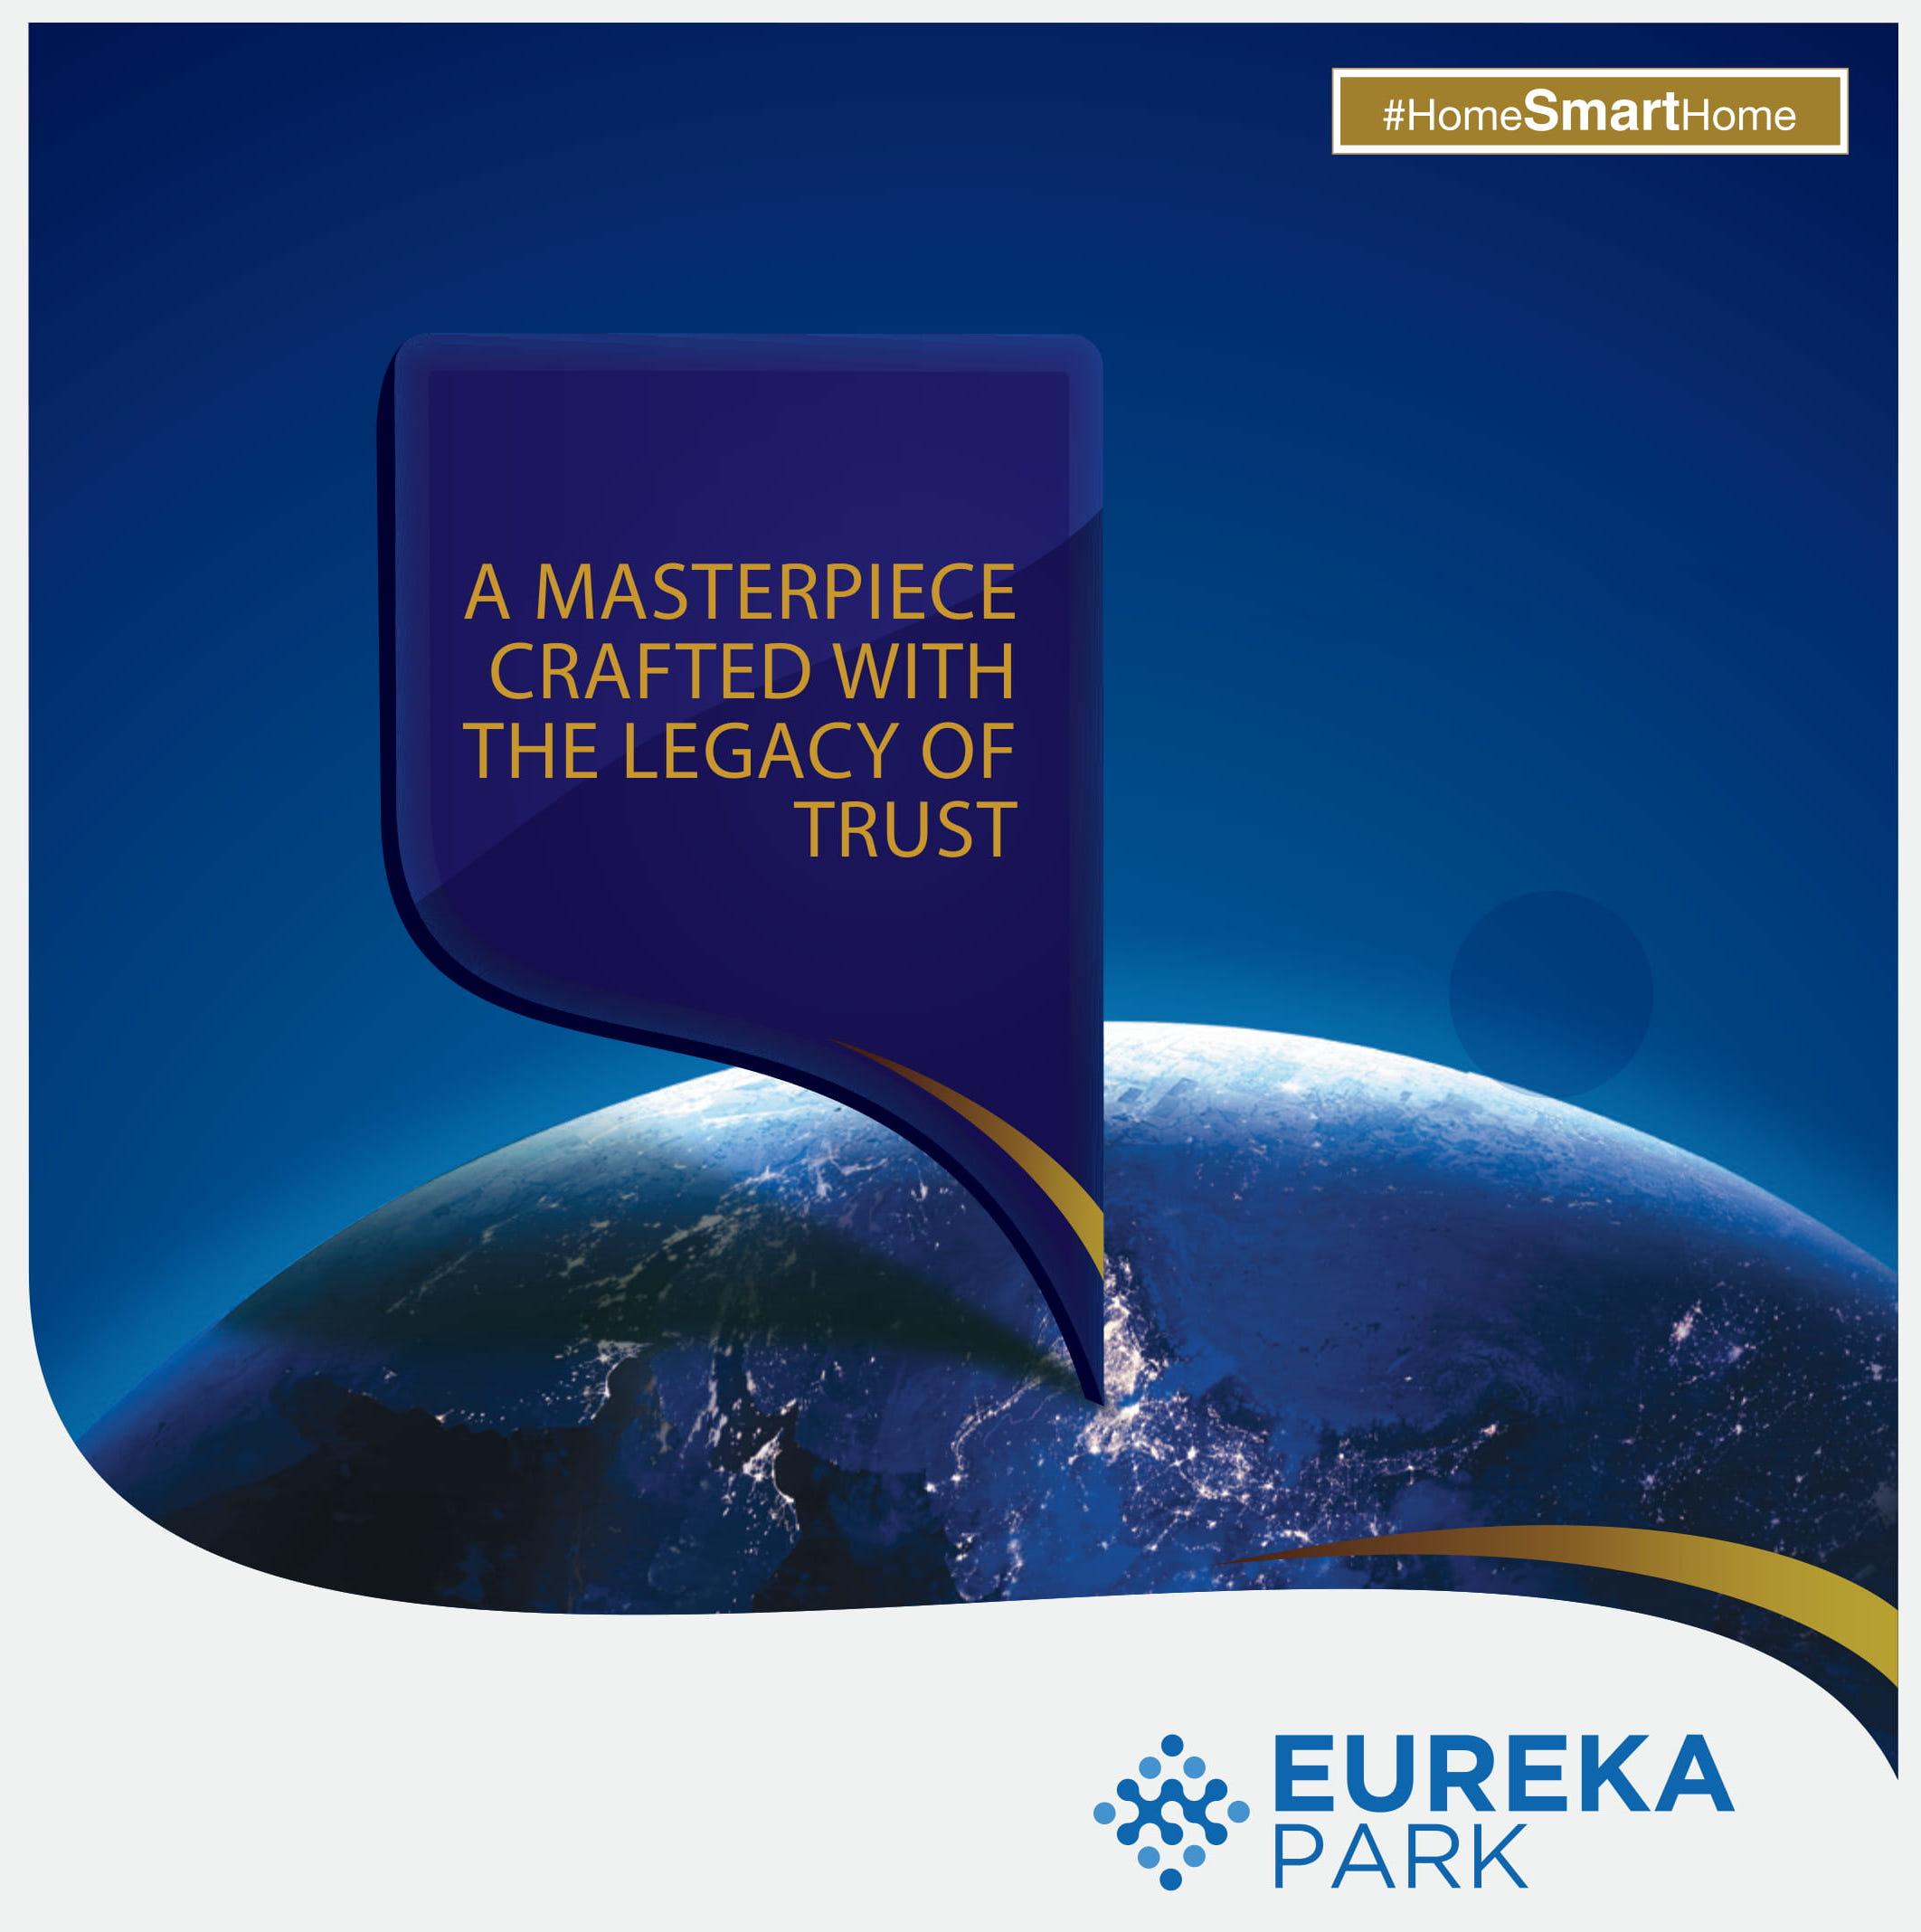 Tata Eureka Park | Tata Eureka Park Sector 150 Noida Call 7709277092